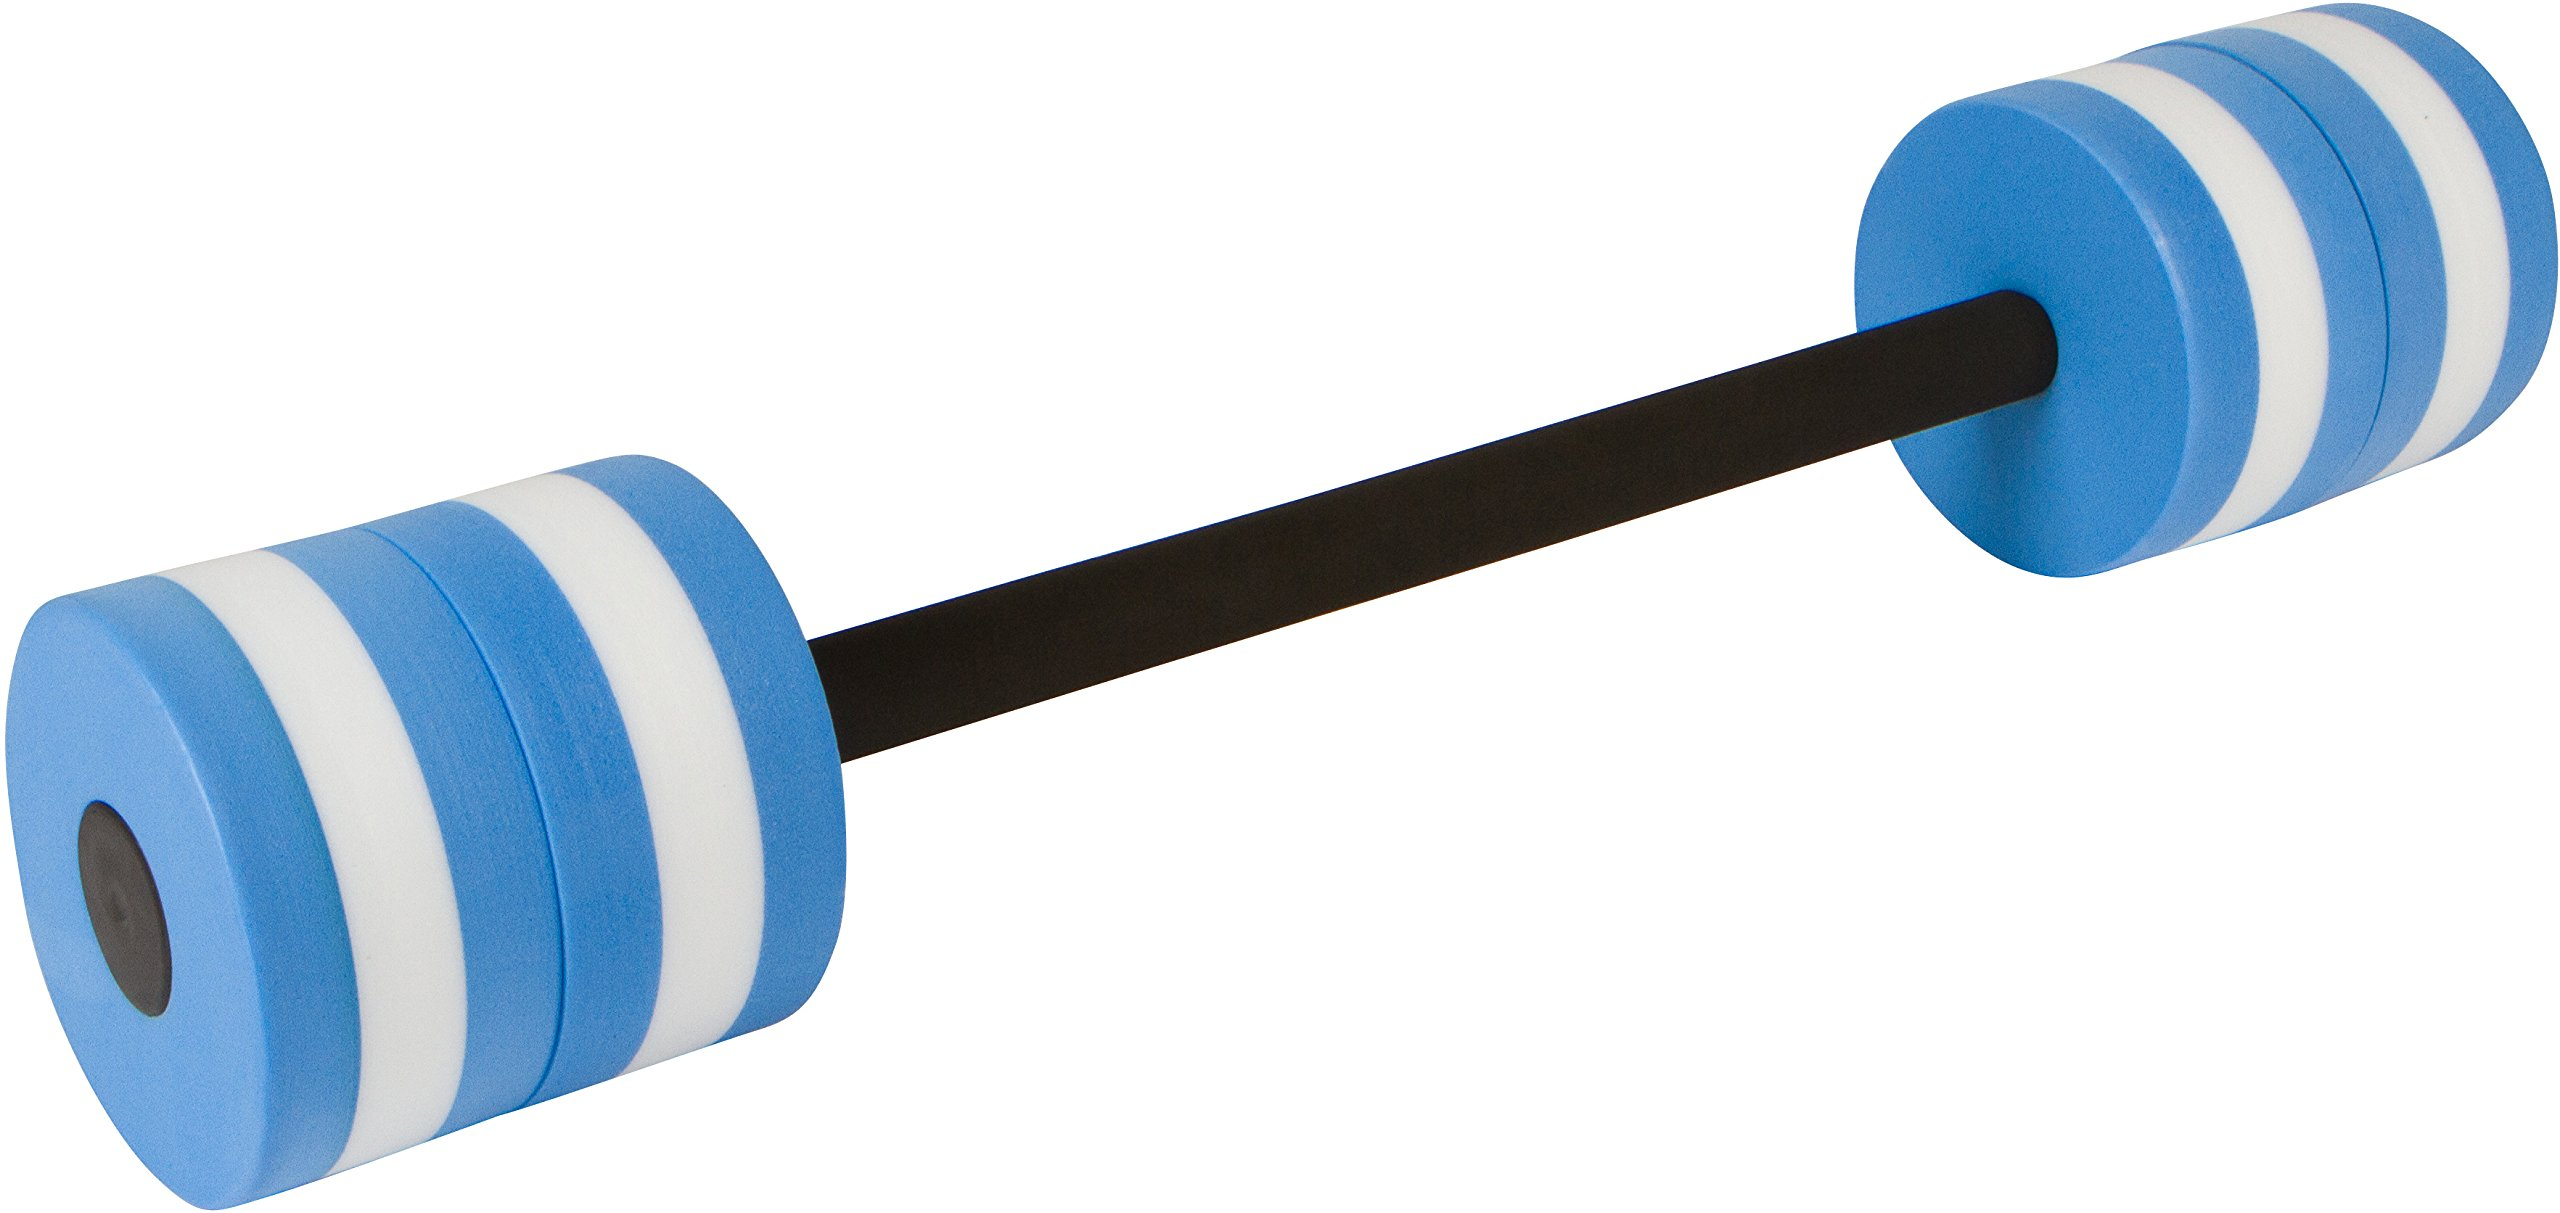 Trademark Innovations 30'' Aqua Fitness Swim Bar with Padded Grip by Trademark Innovations